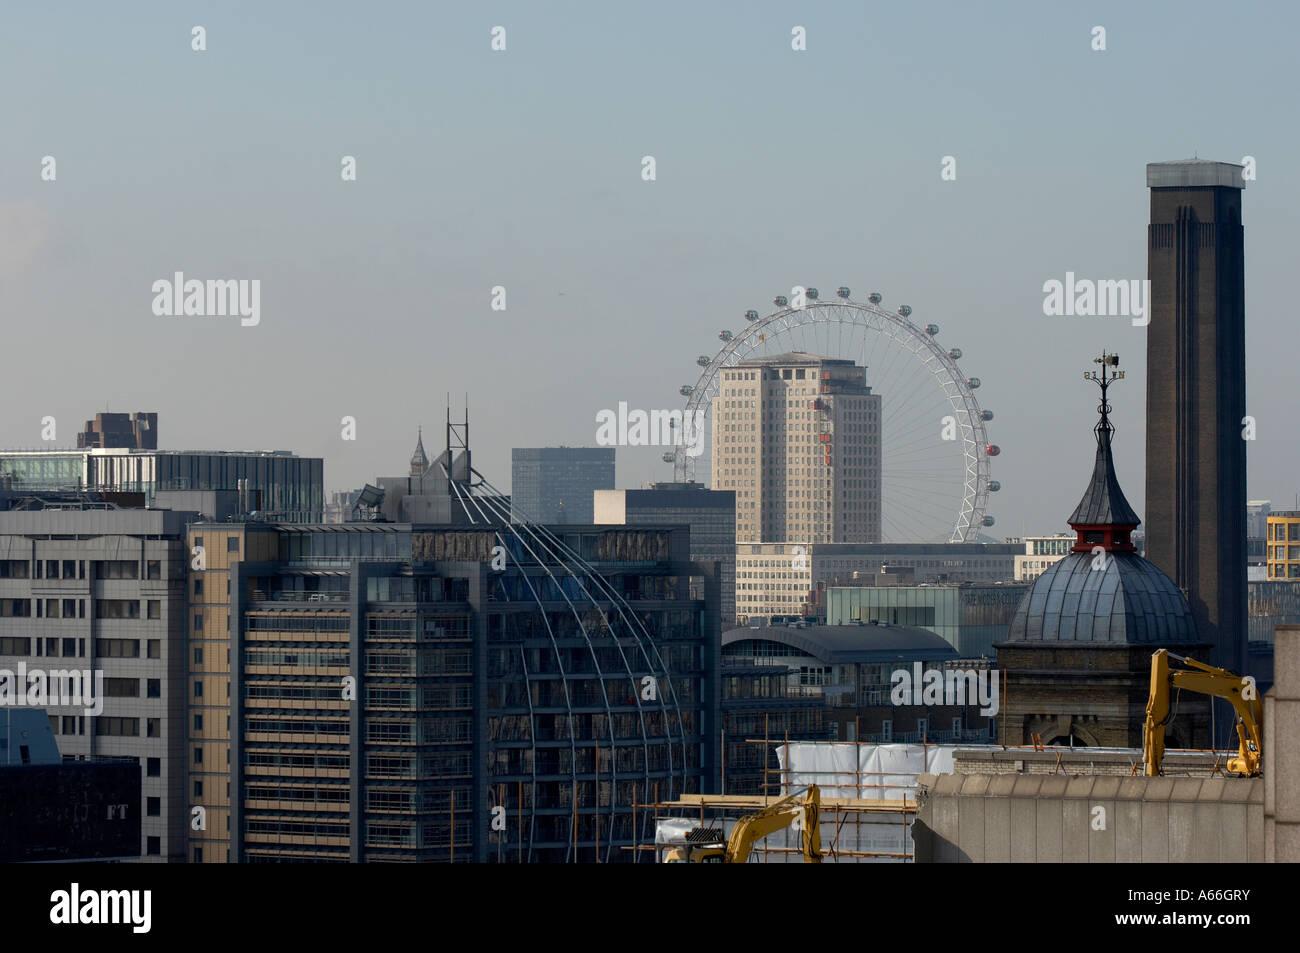 London skyline - Stock Image